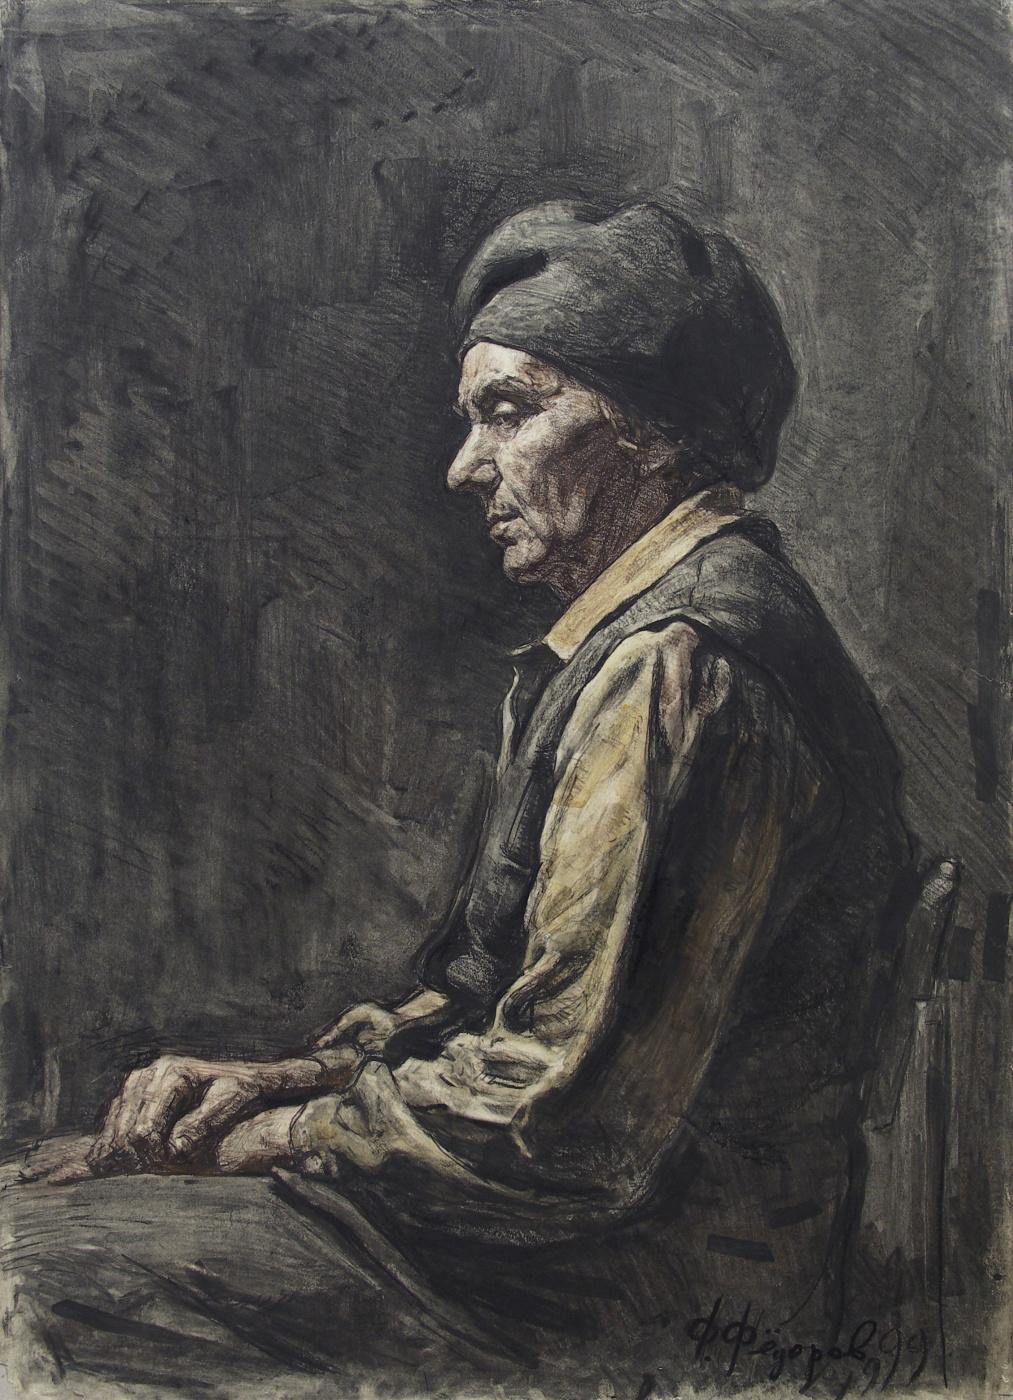 Фёдор Борисович Фёдоров. Portrait of Rimma Petrovna Bazarova